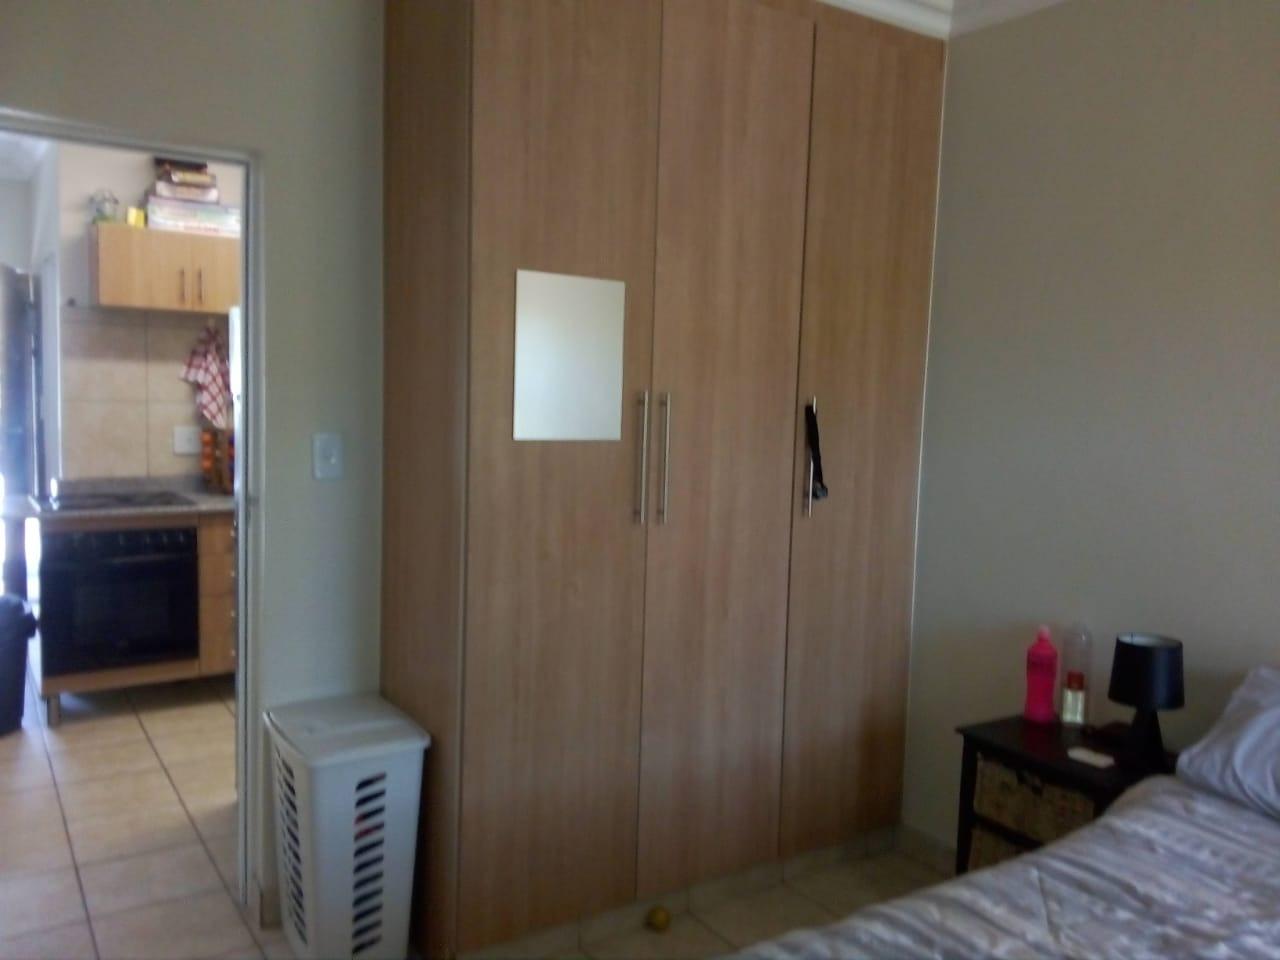 Bed1 Cupboards.jpeg